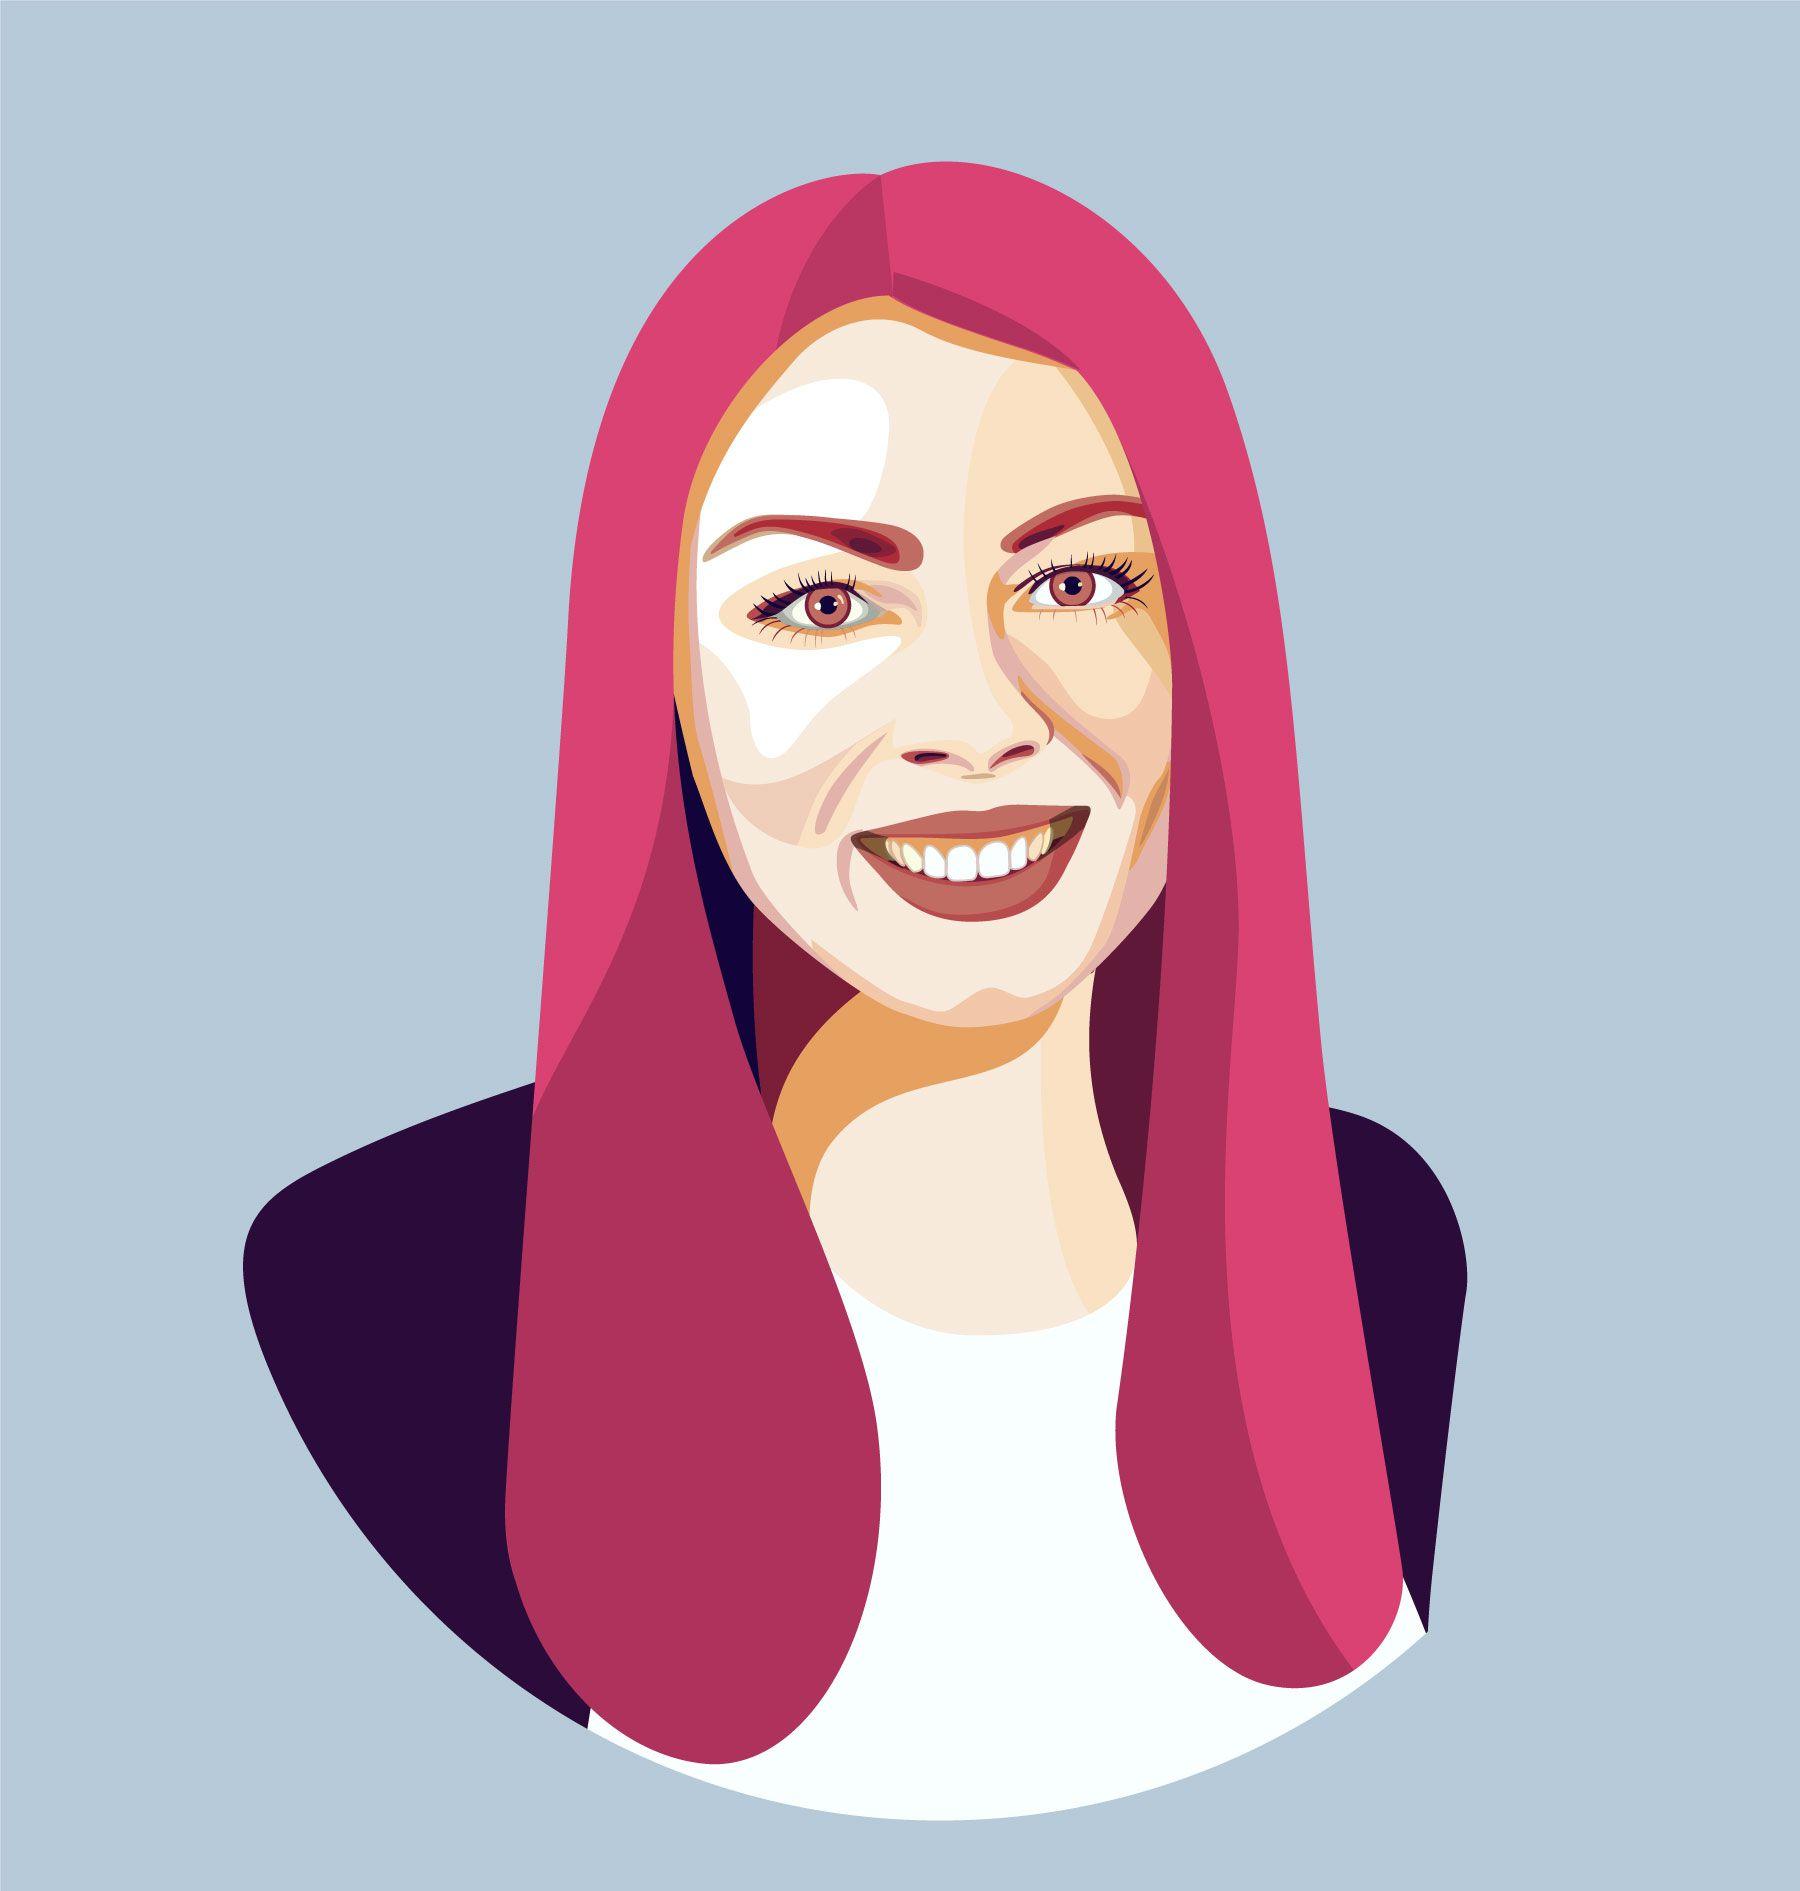 Ksenia Yudina portrait illustration